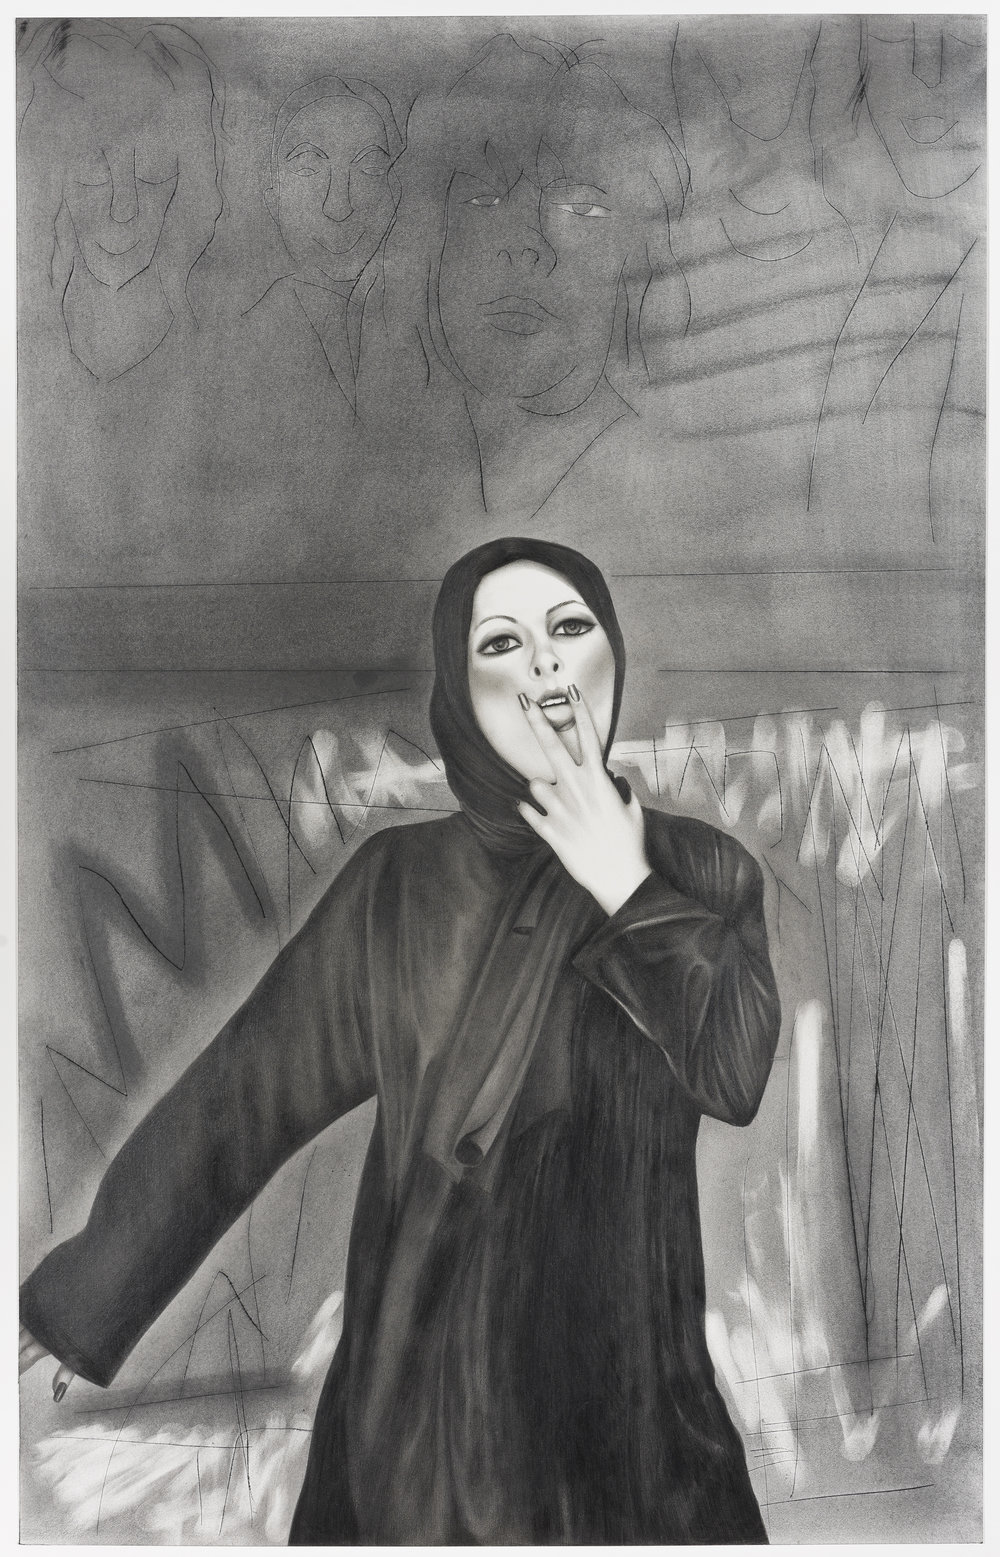 Taravat Talepasand  Blasphemy VIII , 2016 graphite on paper 22h x 15w in.